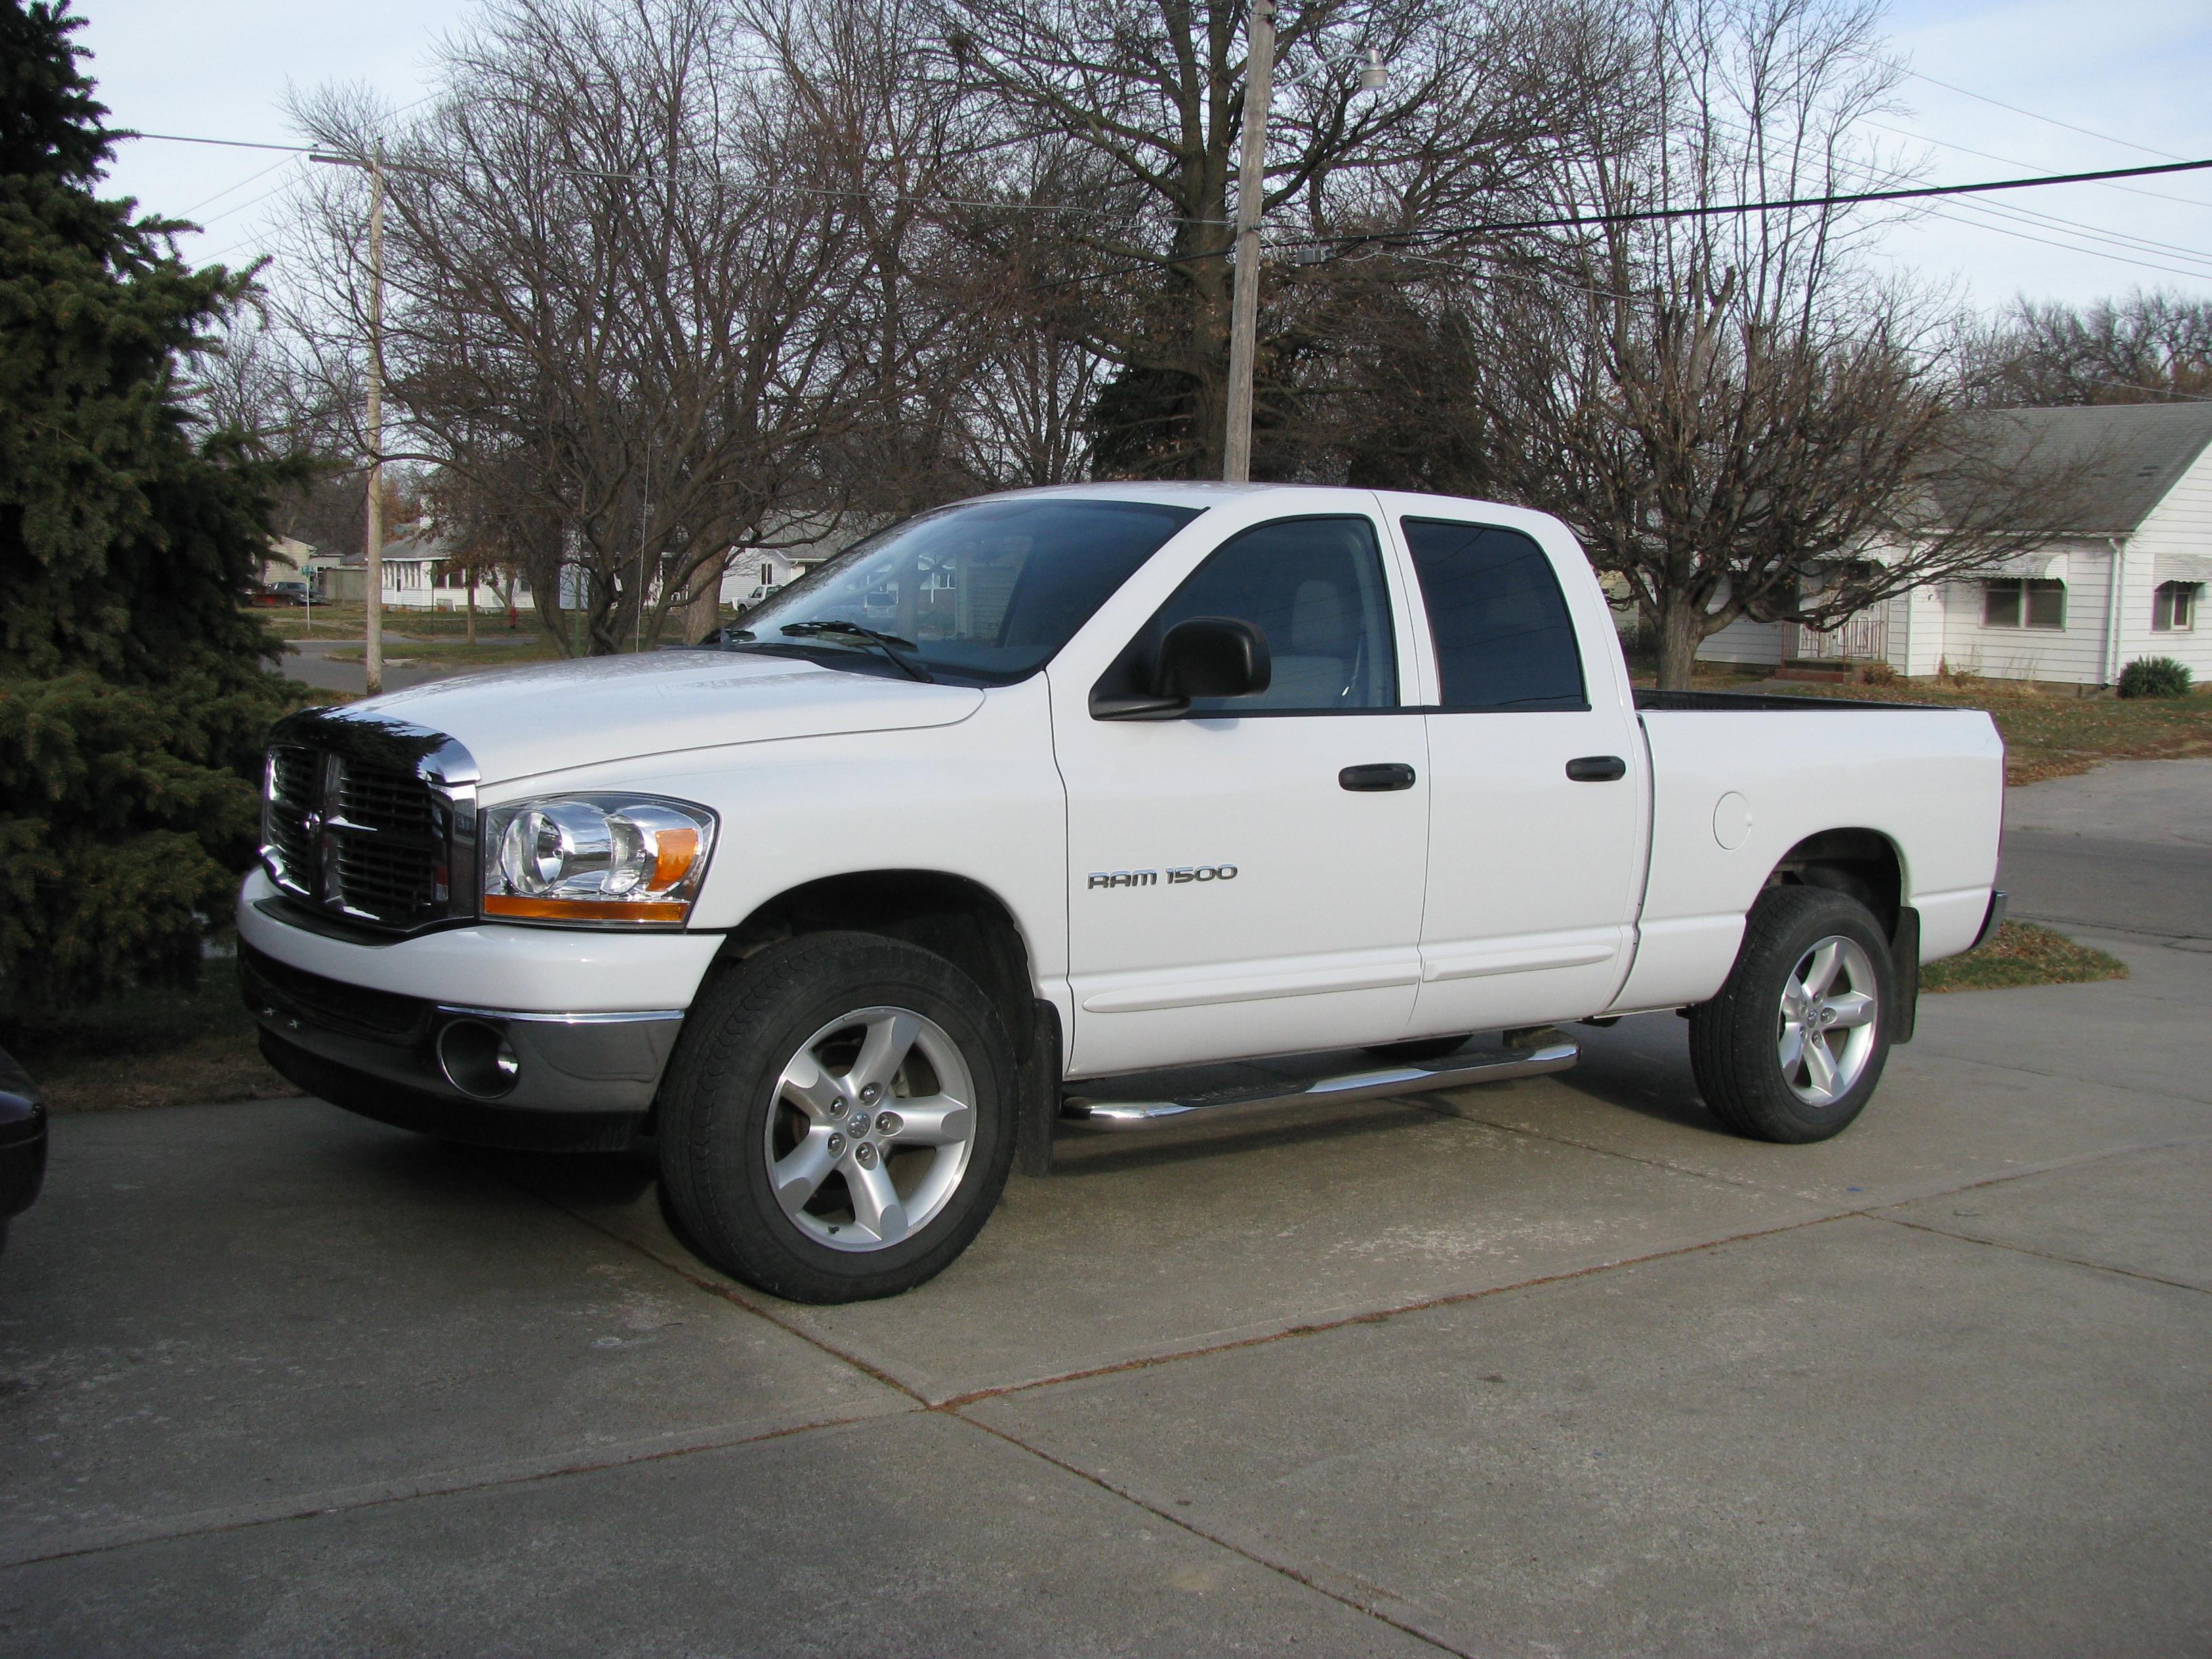 2006 dodge ram pickup 1500 9 dodge ram pickup 1500 9